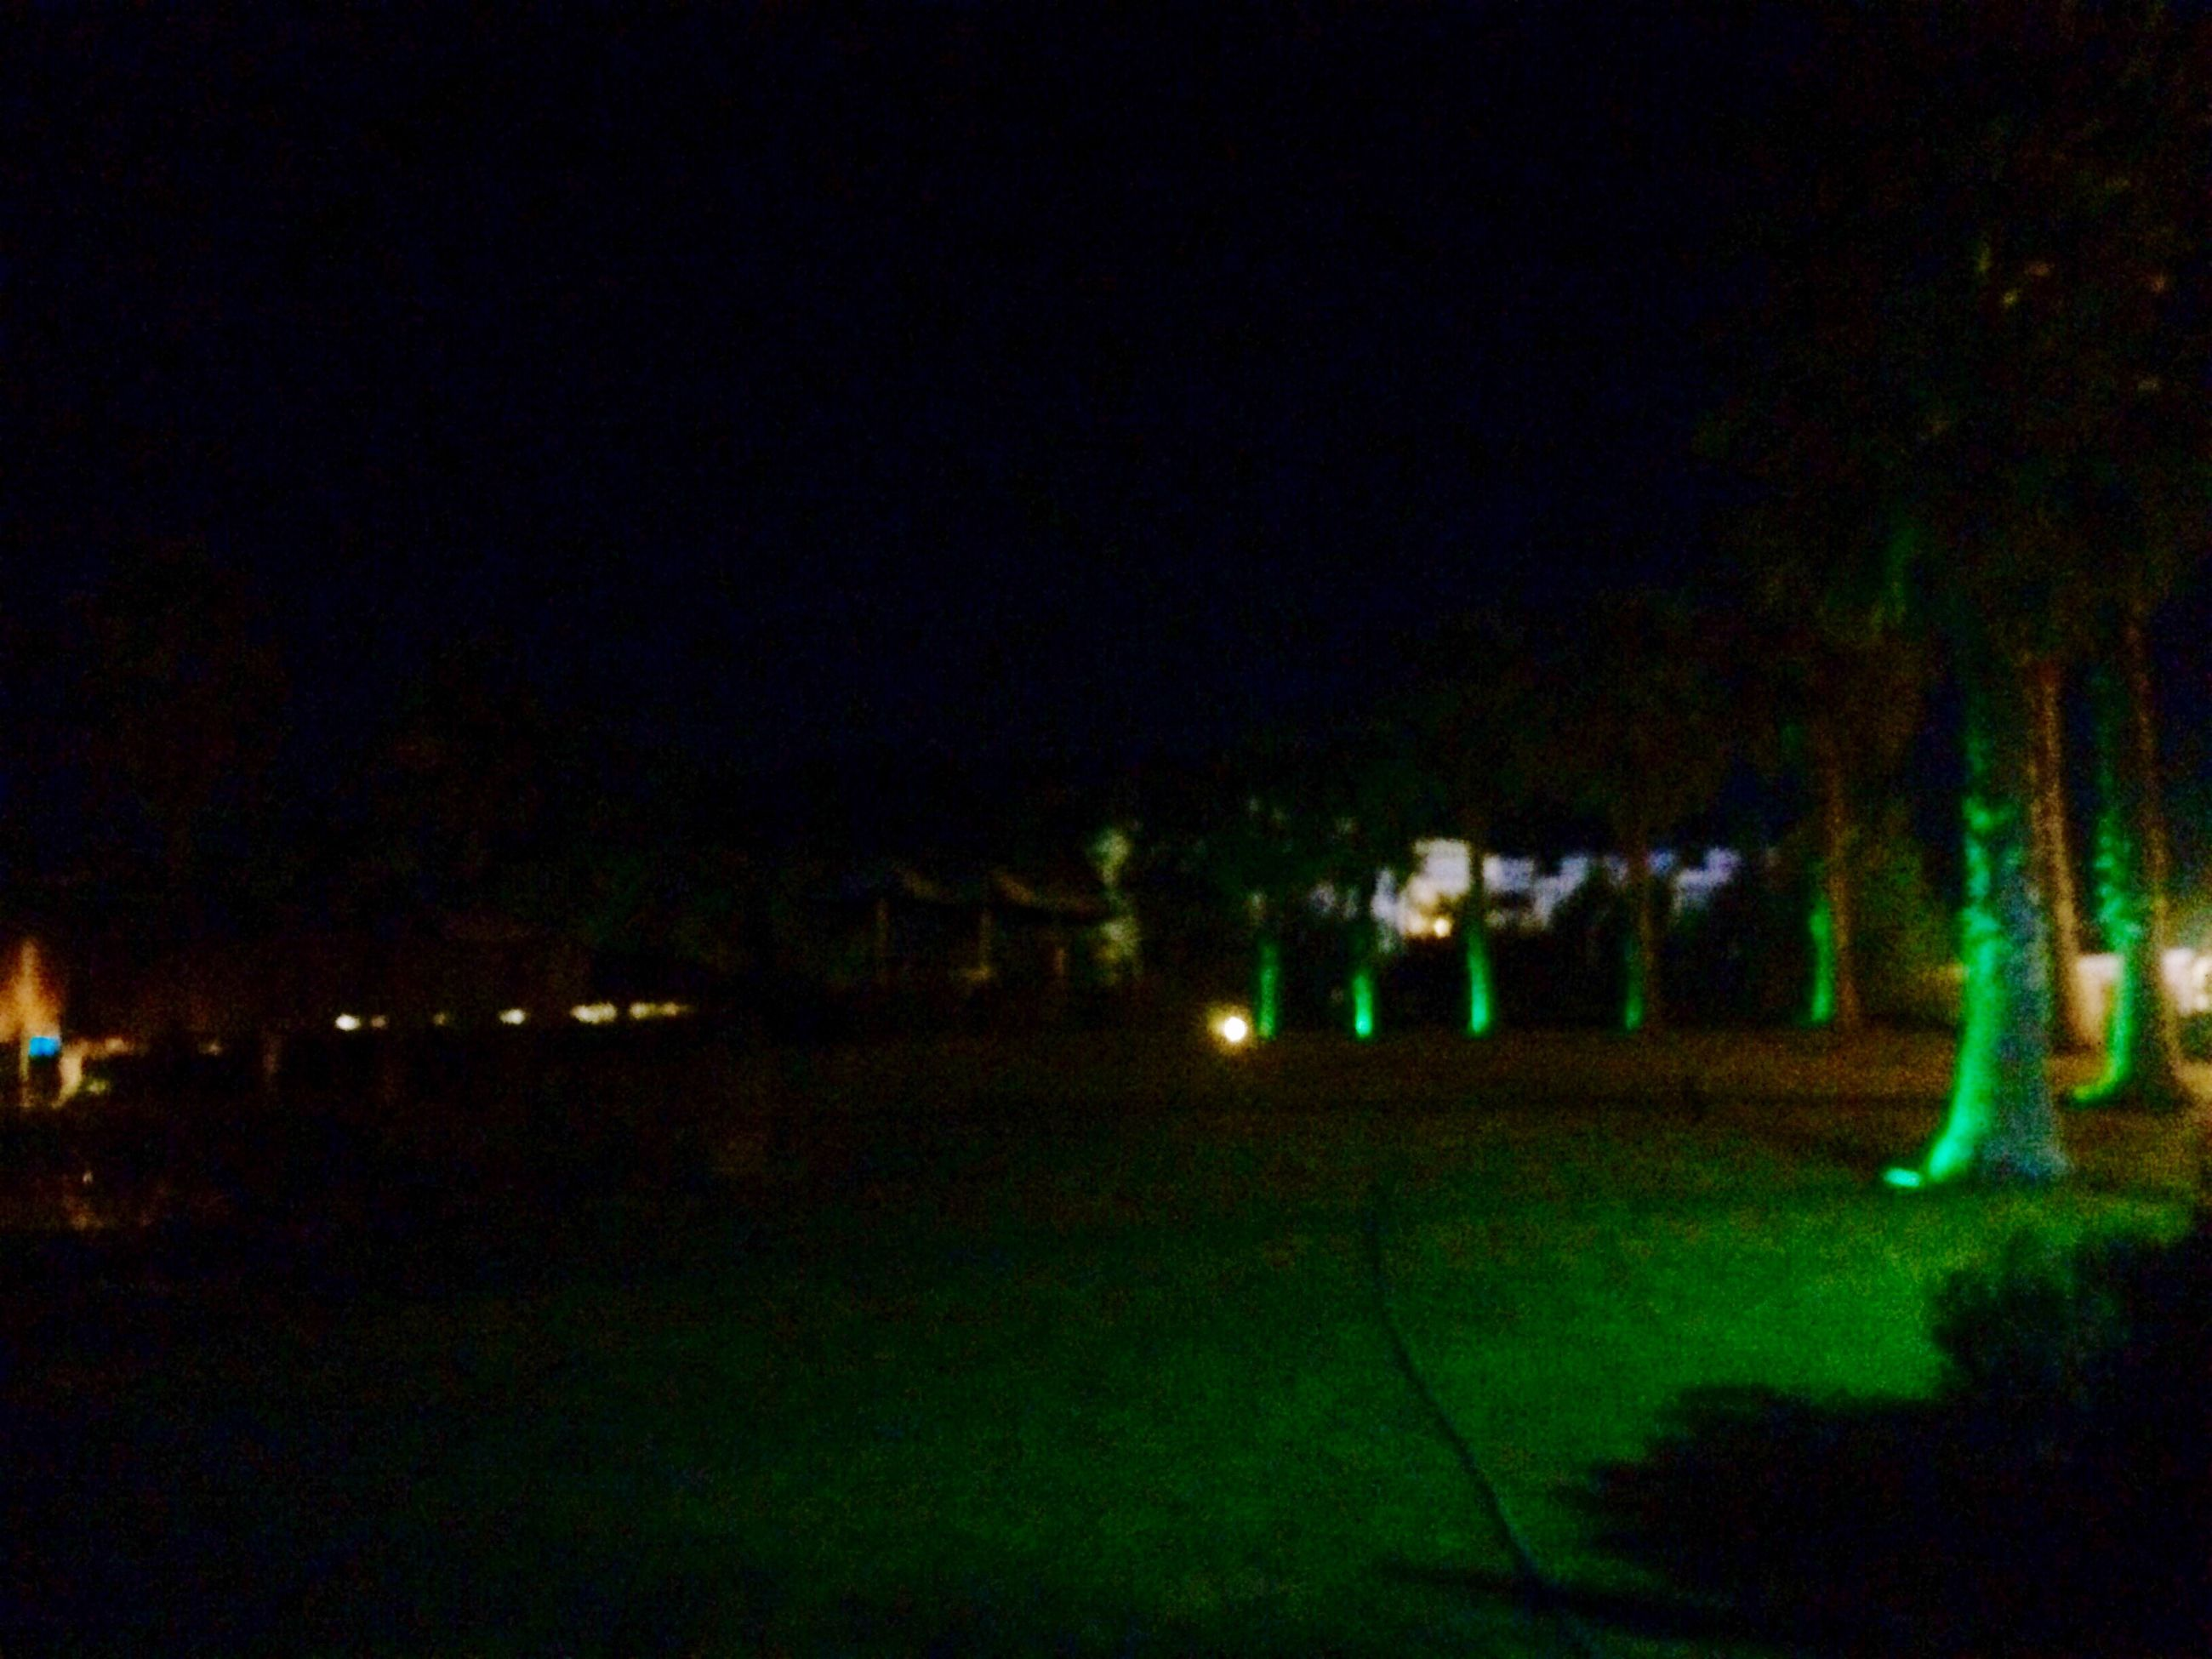 night, illuminated, no people, dark, outdoors, city, sky